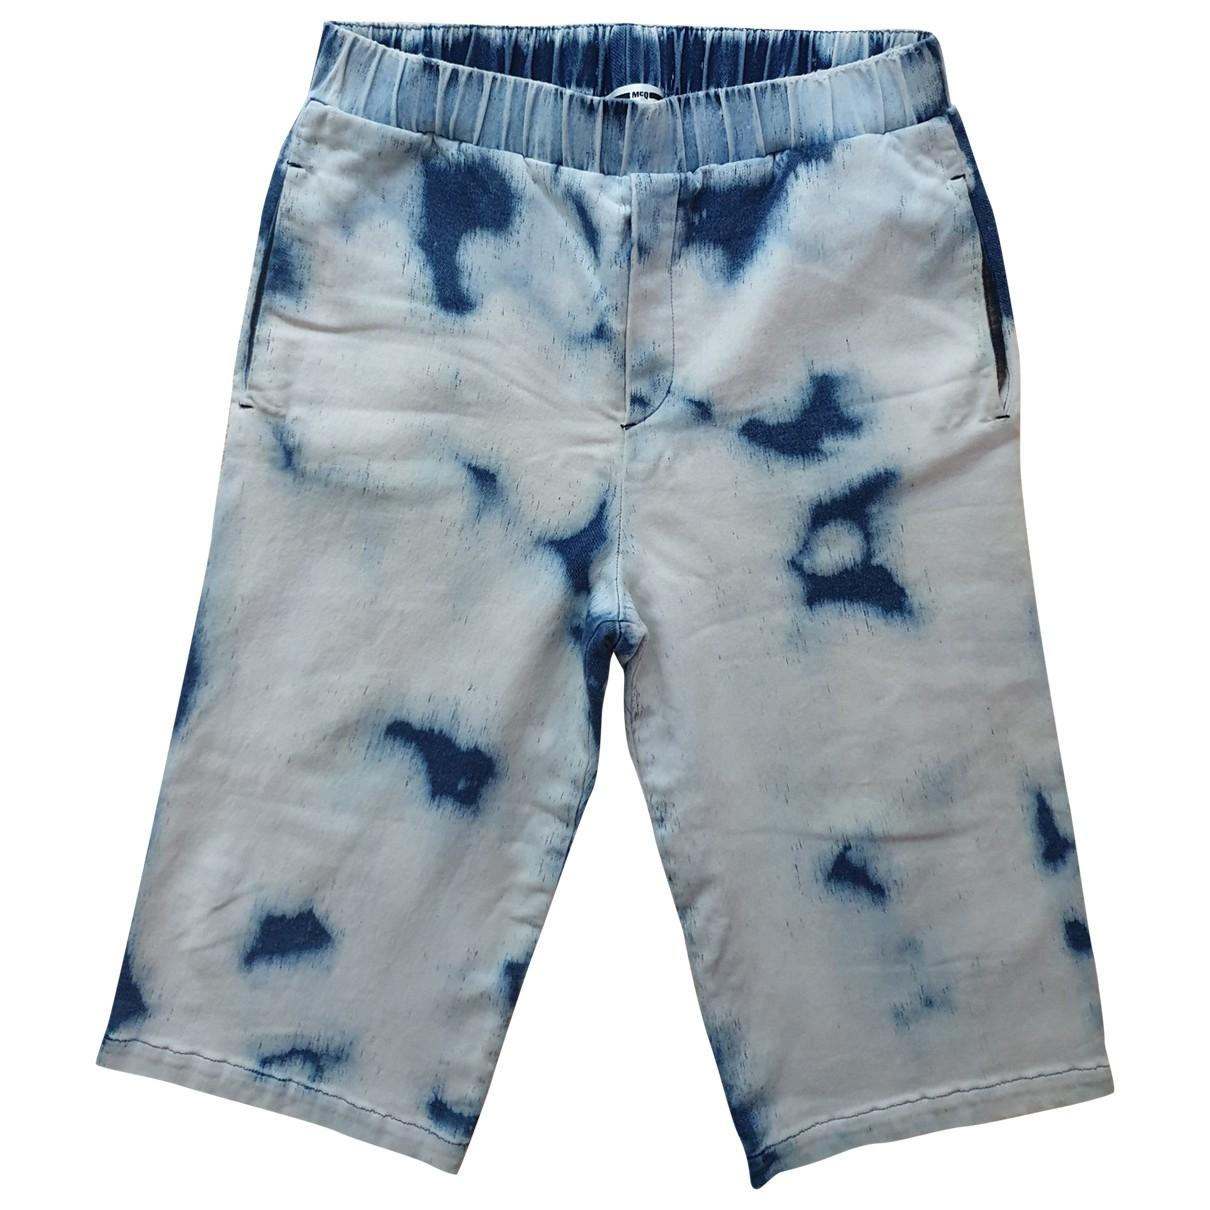 Mcq \N Multicolour Cotton Shorts for Men M International